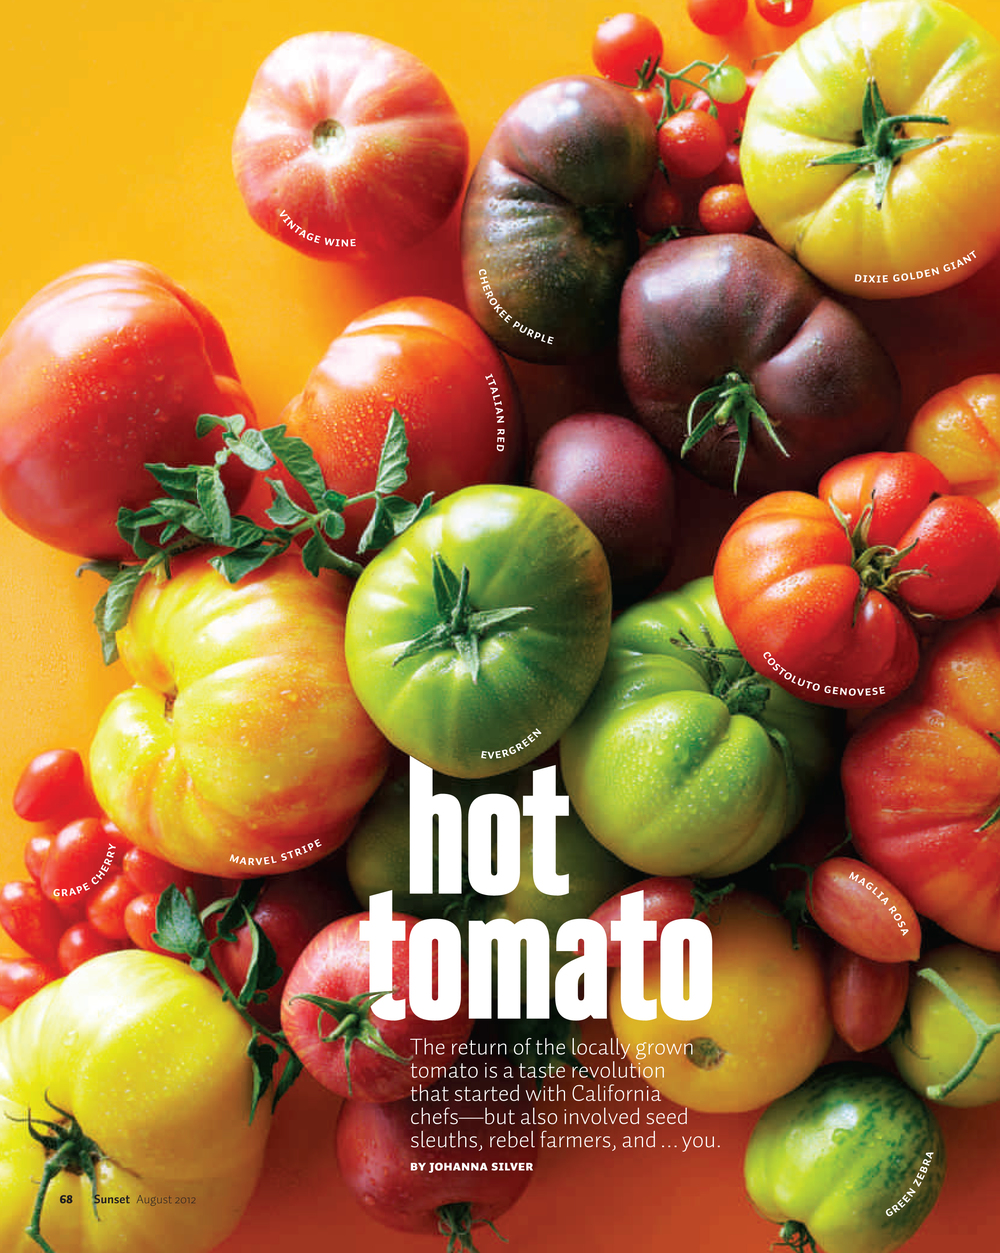 fcc0812t_Tomatoes-1-1.jpg